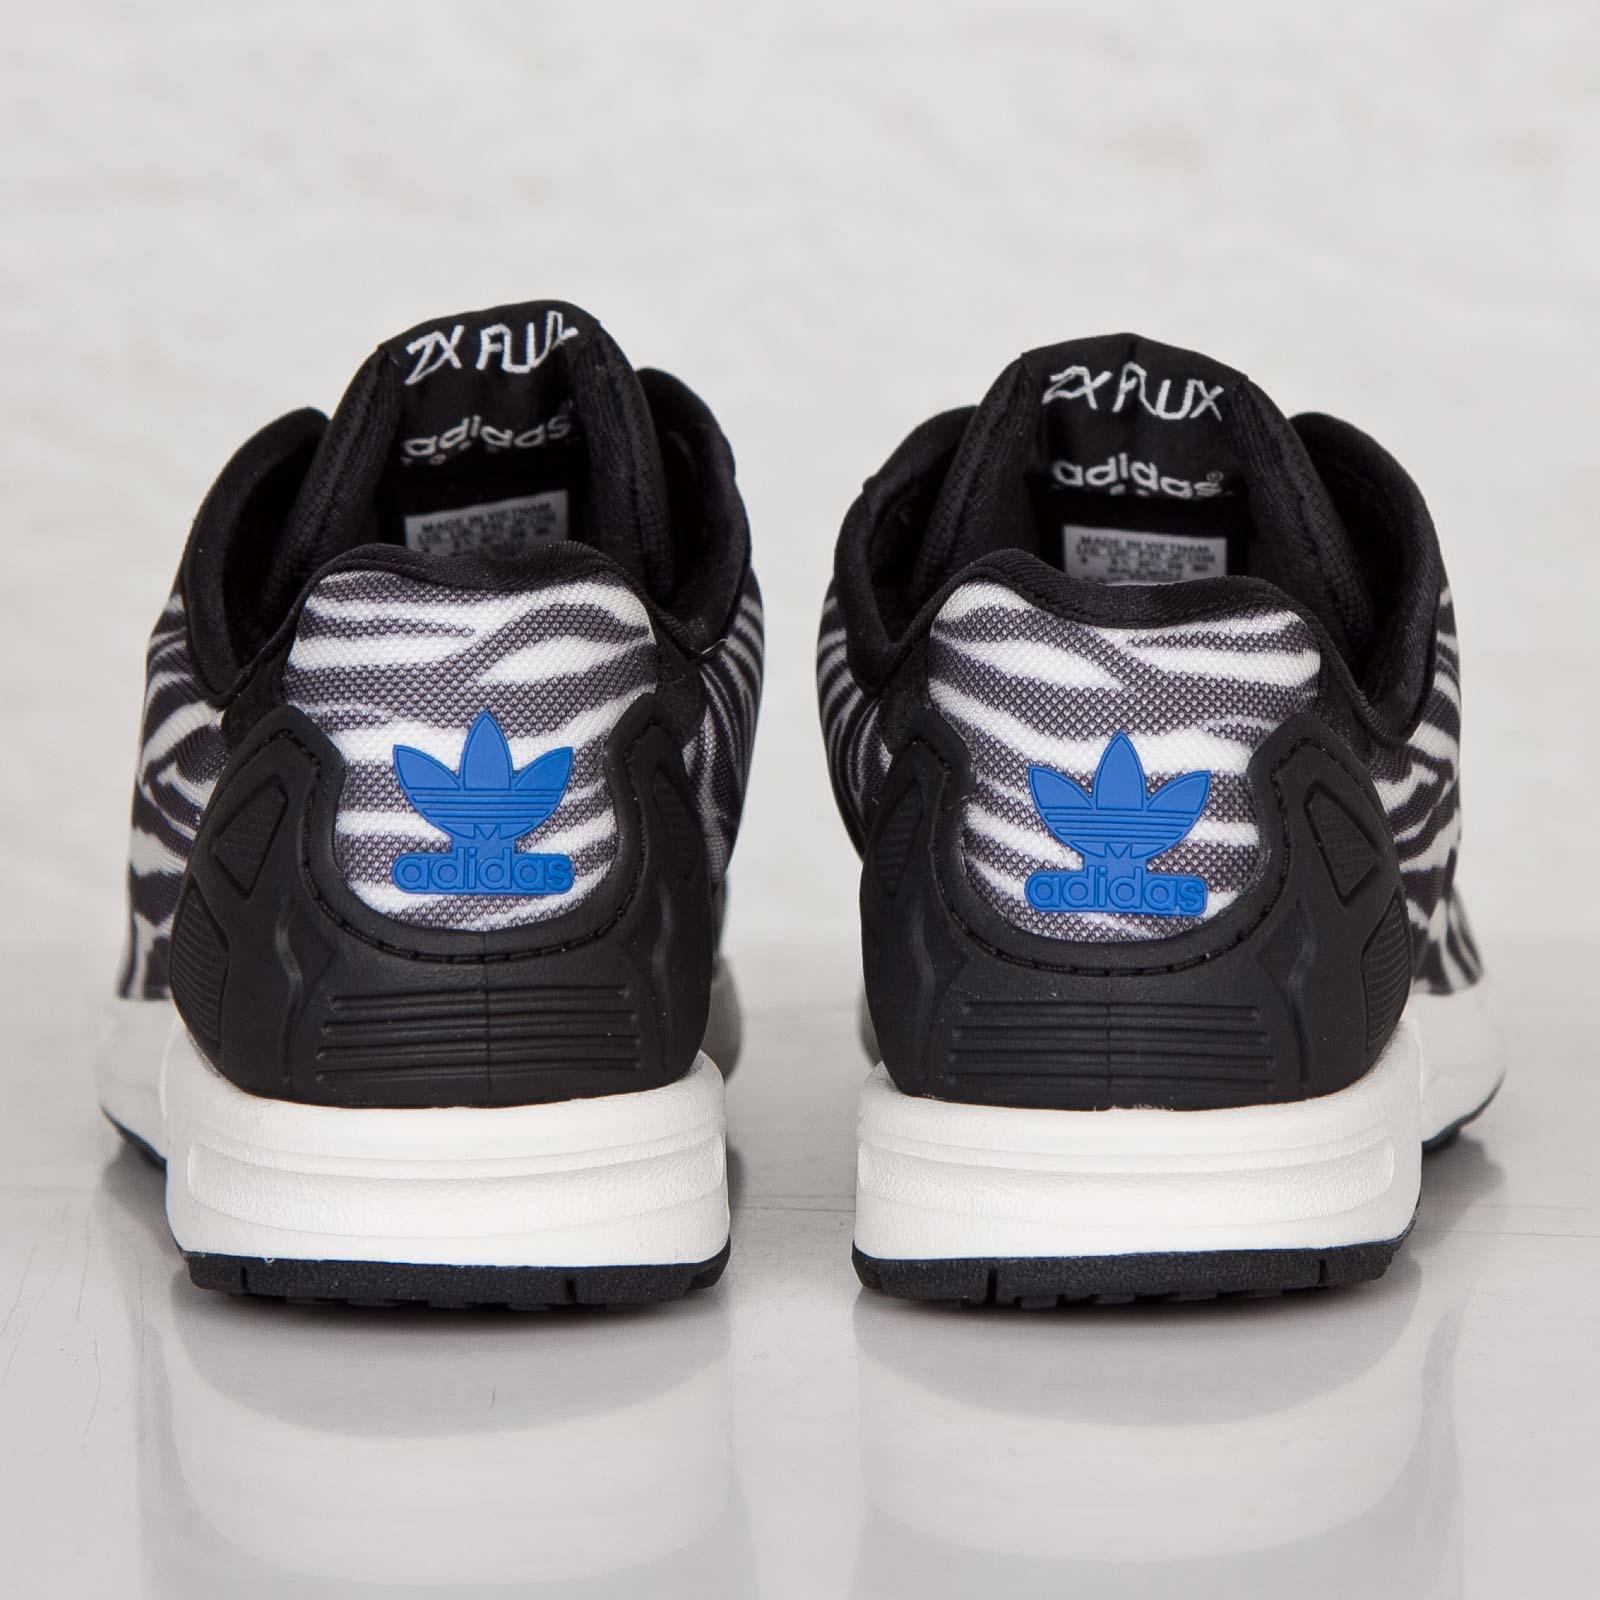 super popular c4ea6 ad610 adidas ZX Flux Deconstructed - B23728 - Sneakersnstuff   sneakers    streetwear online since 1999